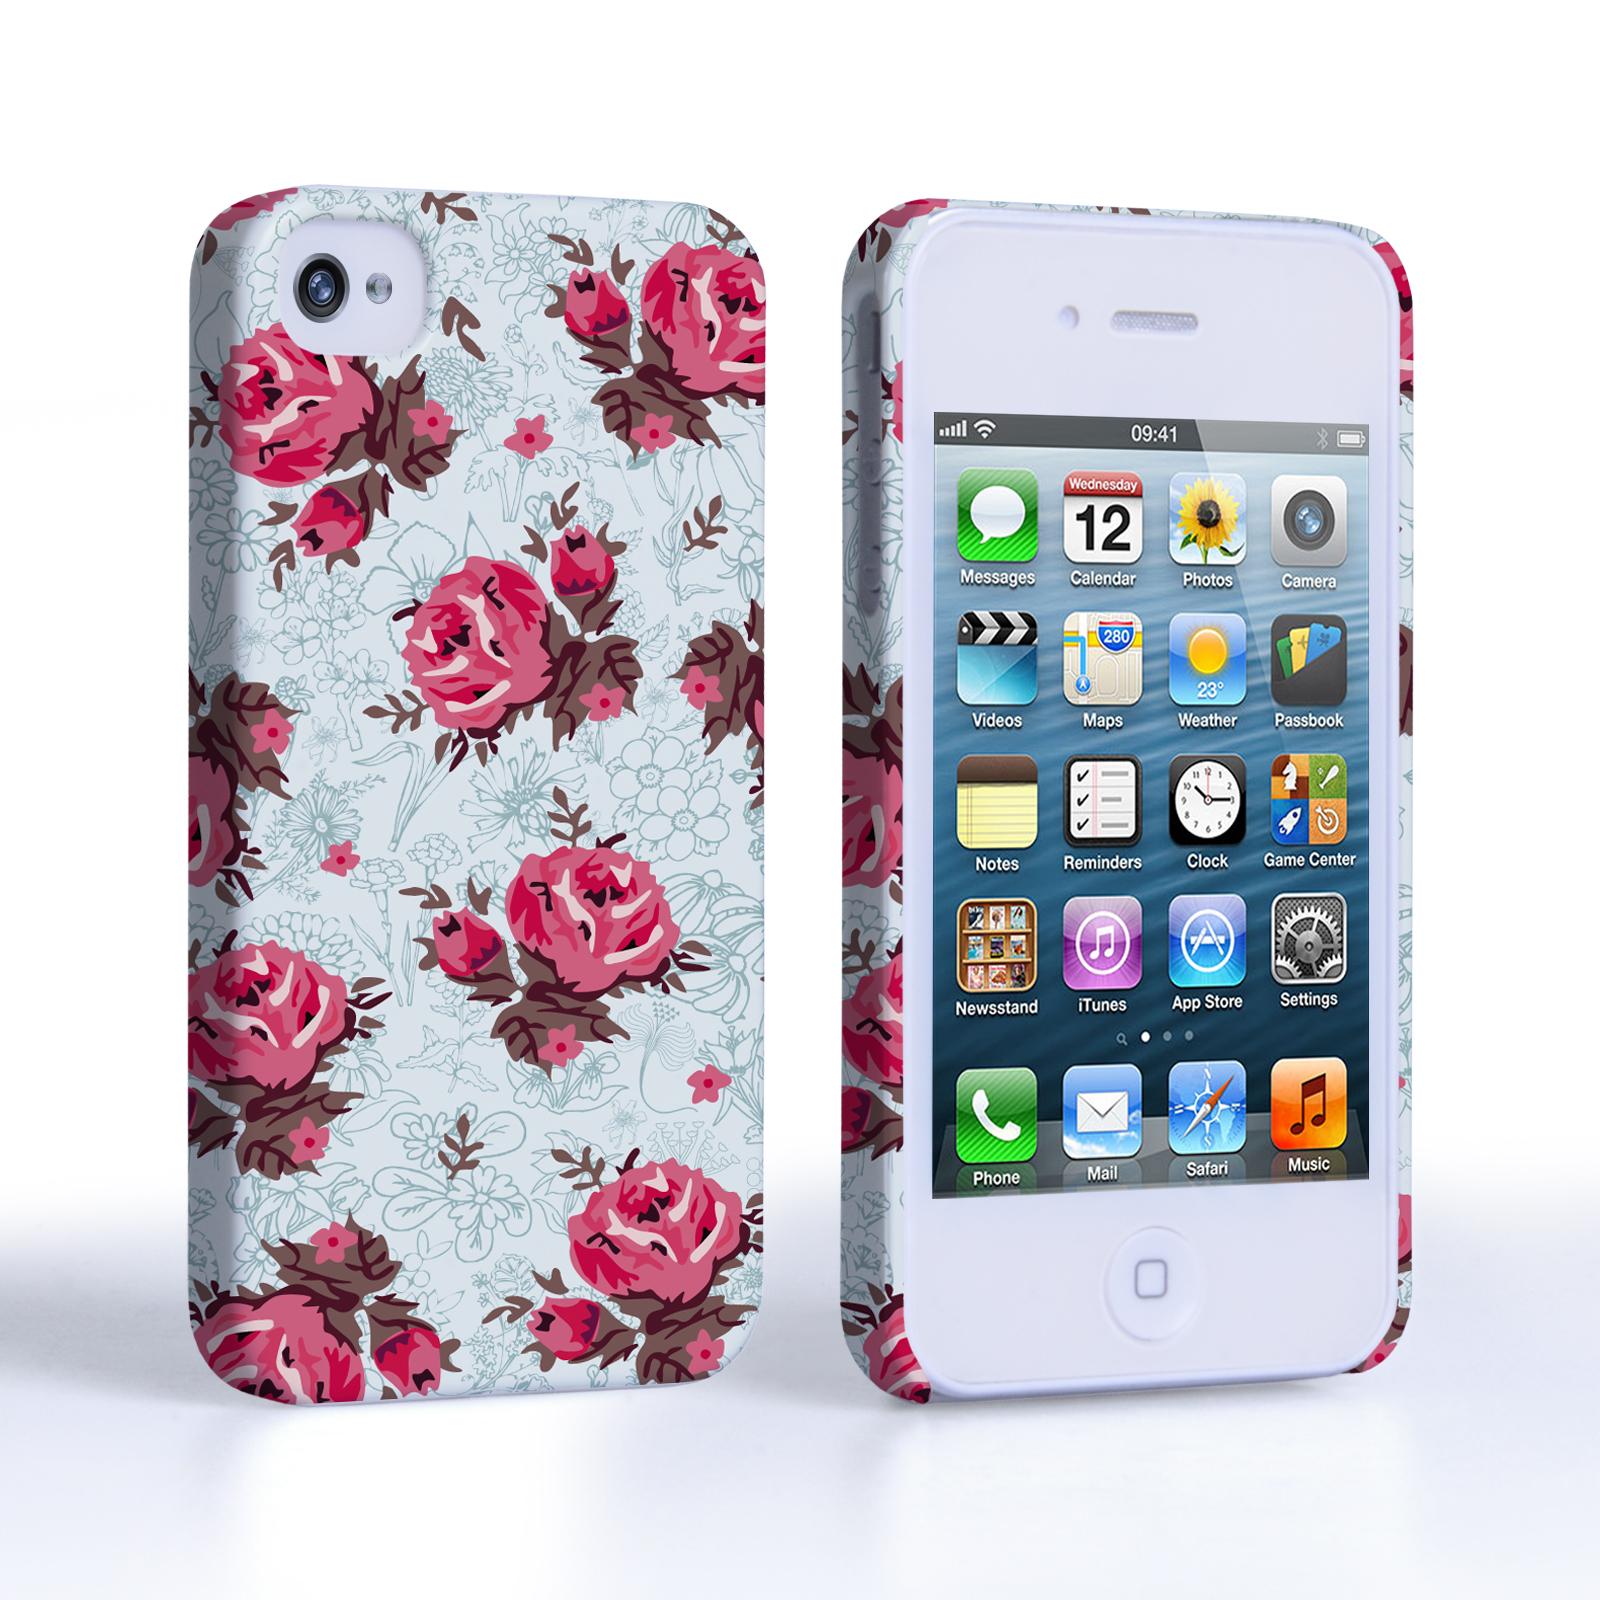 Home Phone Cases Apple iPhone 4 4S Cases Caseflex iPhone 4 1600x1600